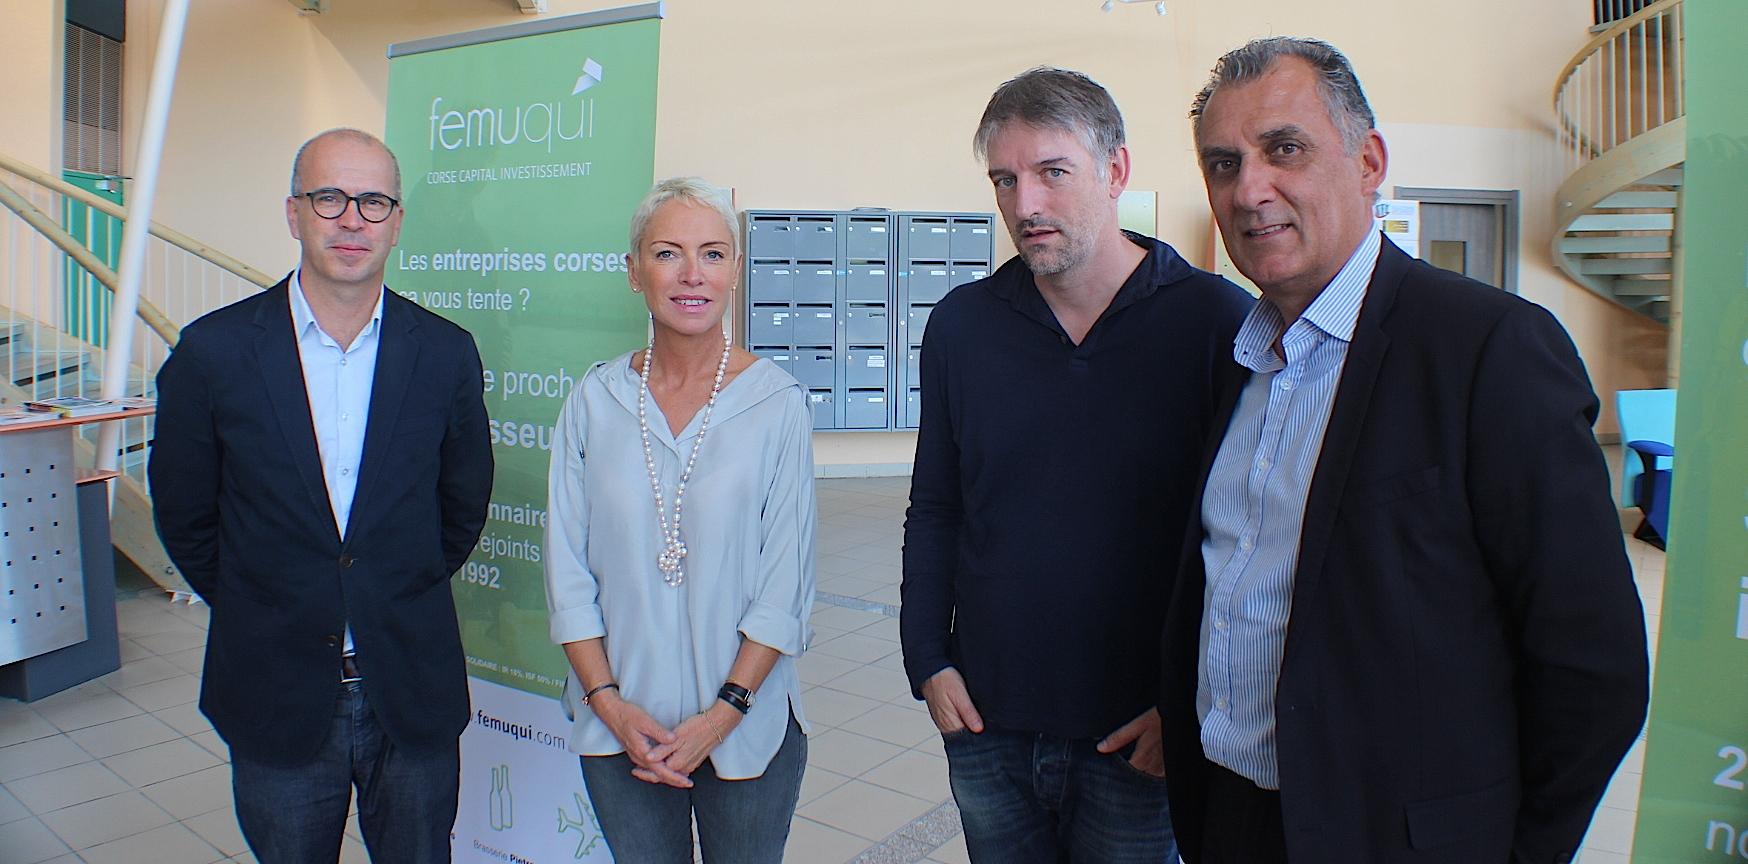 Charles Vellutini, Sandrine Leccia, Sébastien Simoni et Yves de Laroche